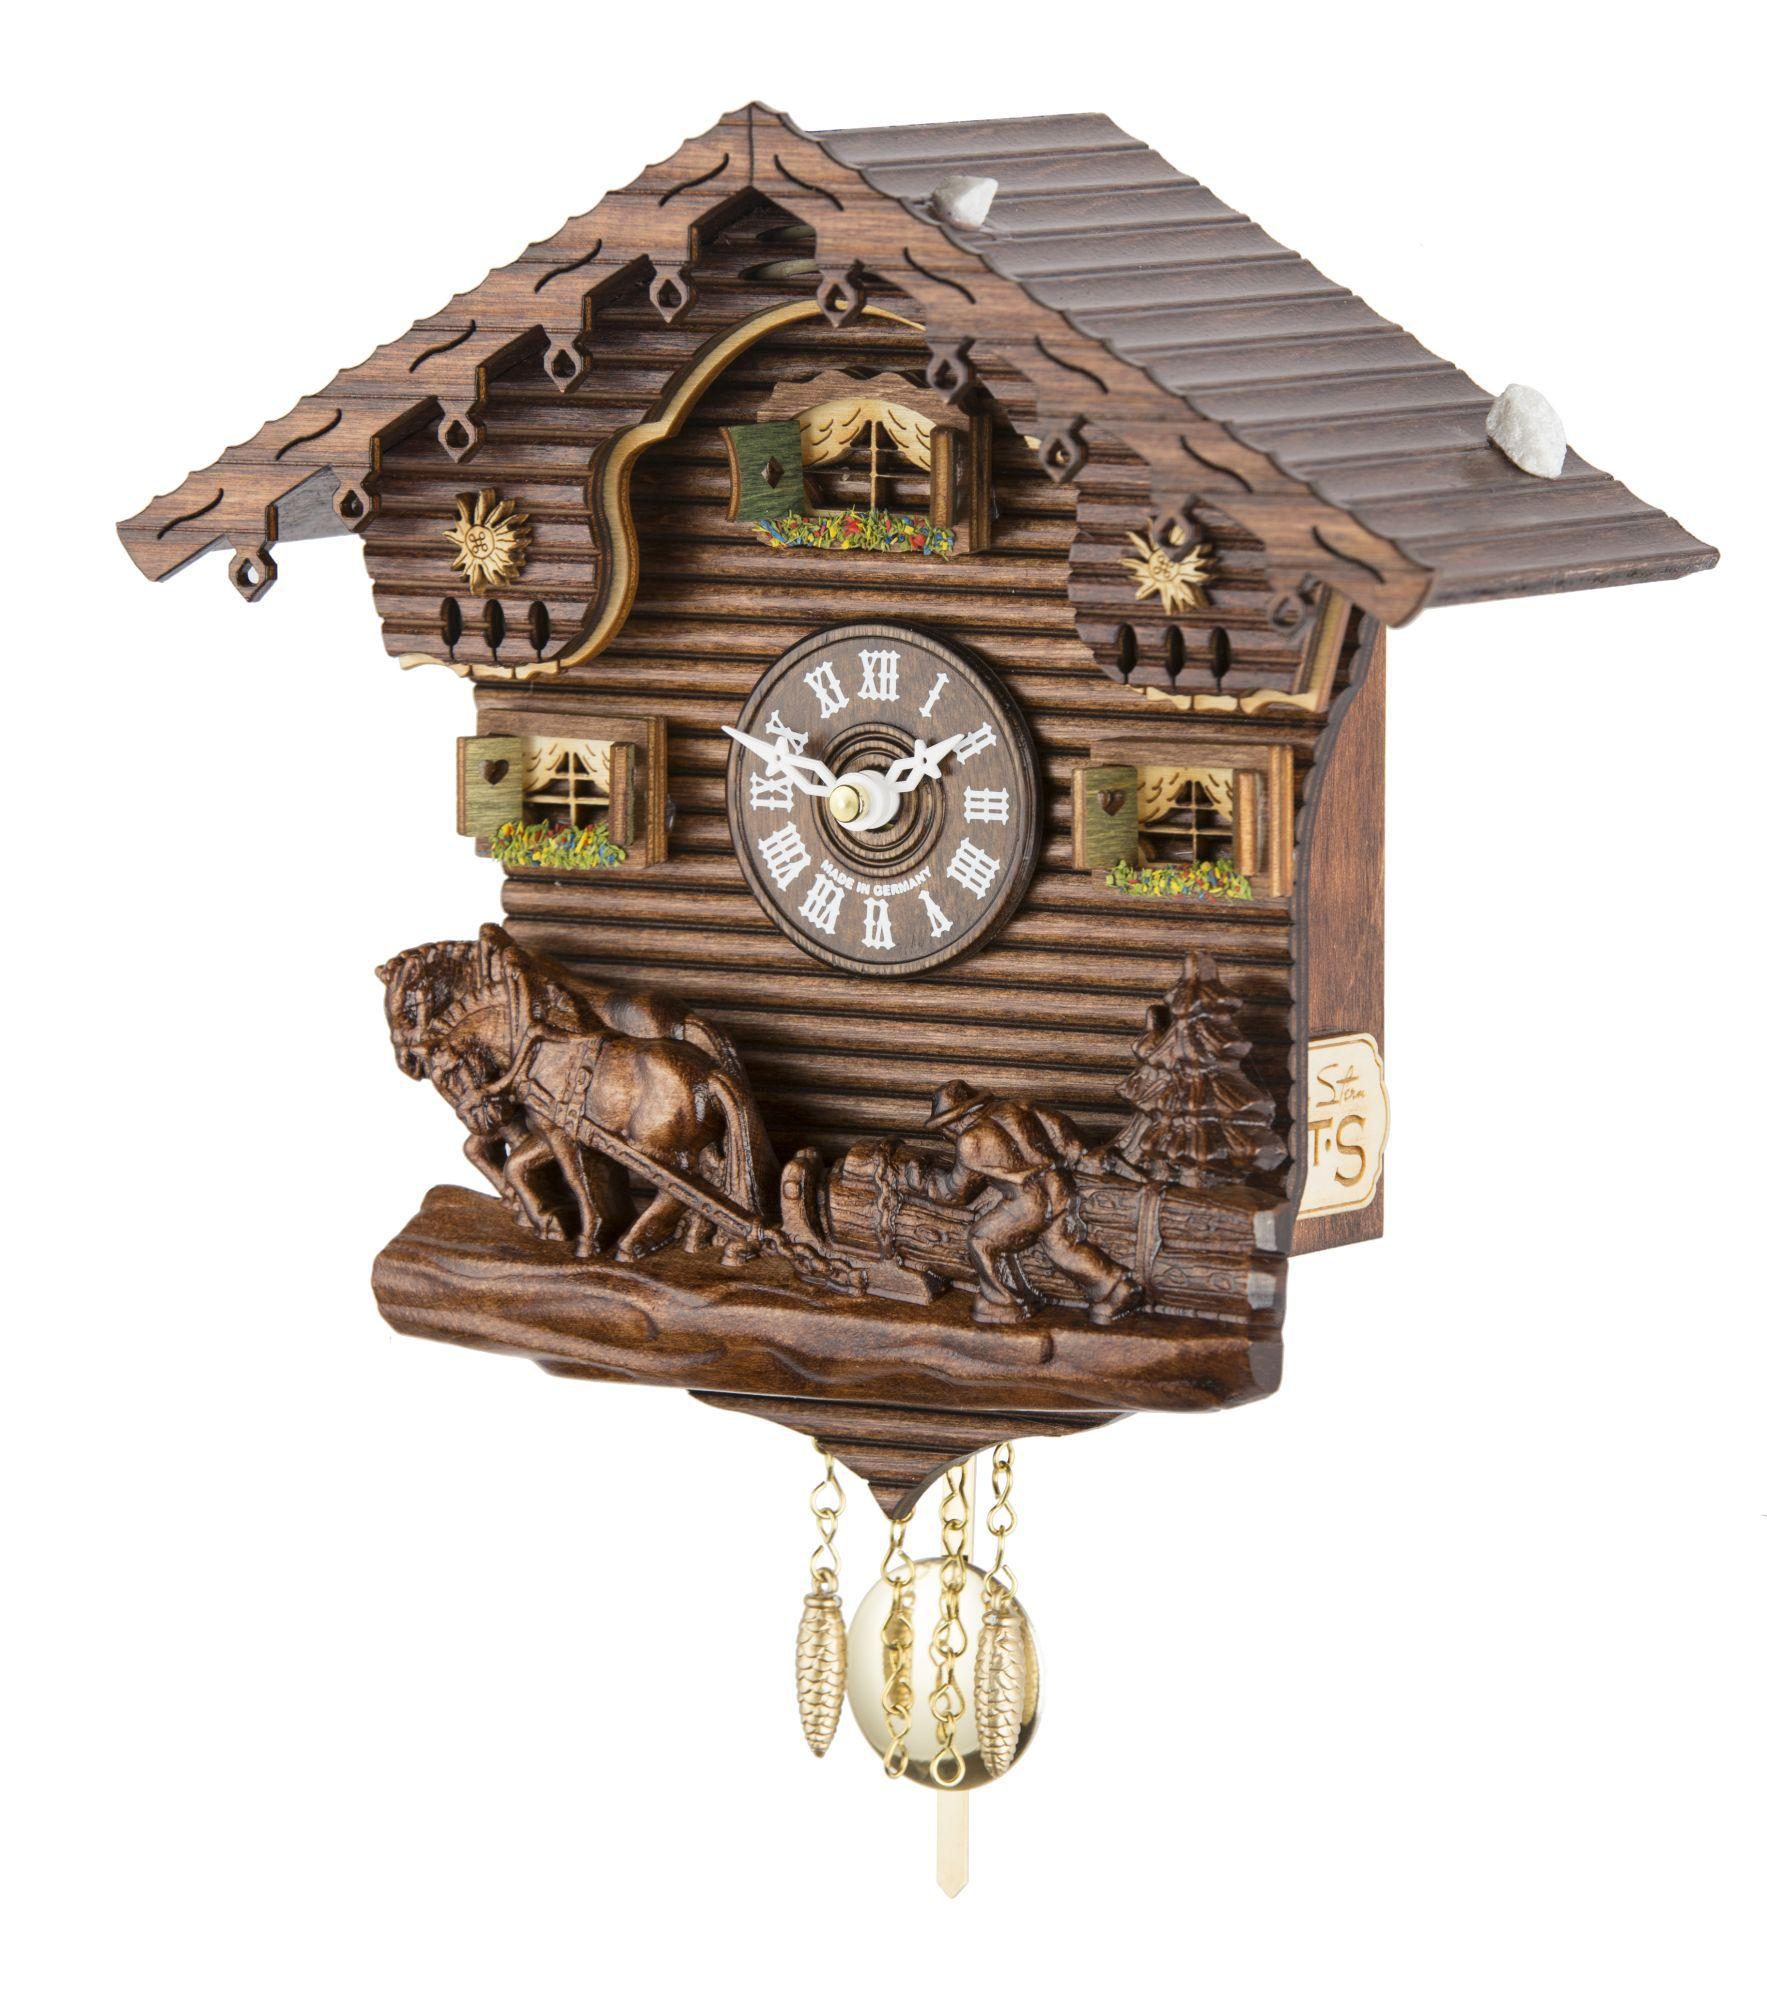 Часы настенные Часы настенные с кукушкой Tomas Stern 5031 chasy-nastennye-s-kukushkoy-tomas-stern-5031-germaniya.jpg